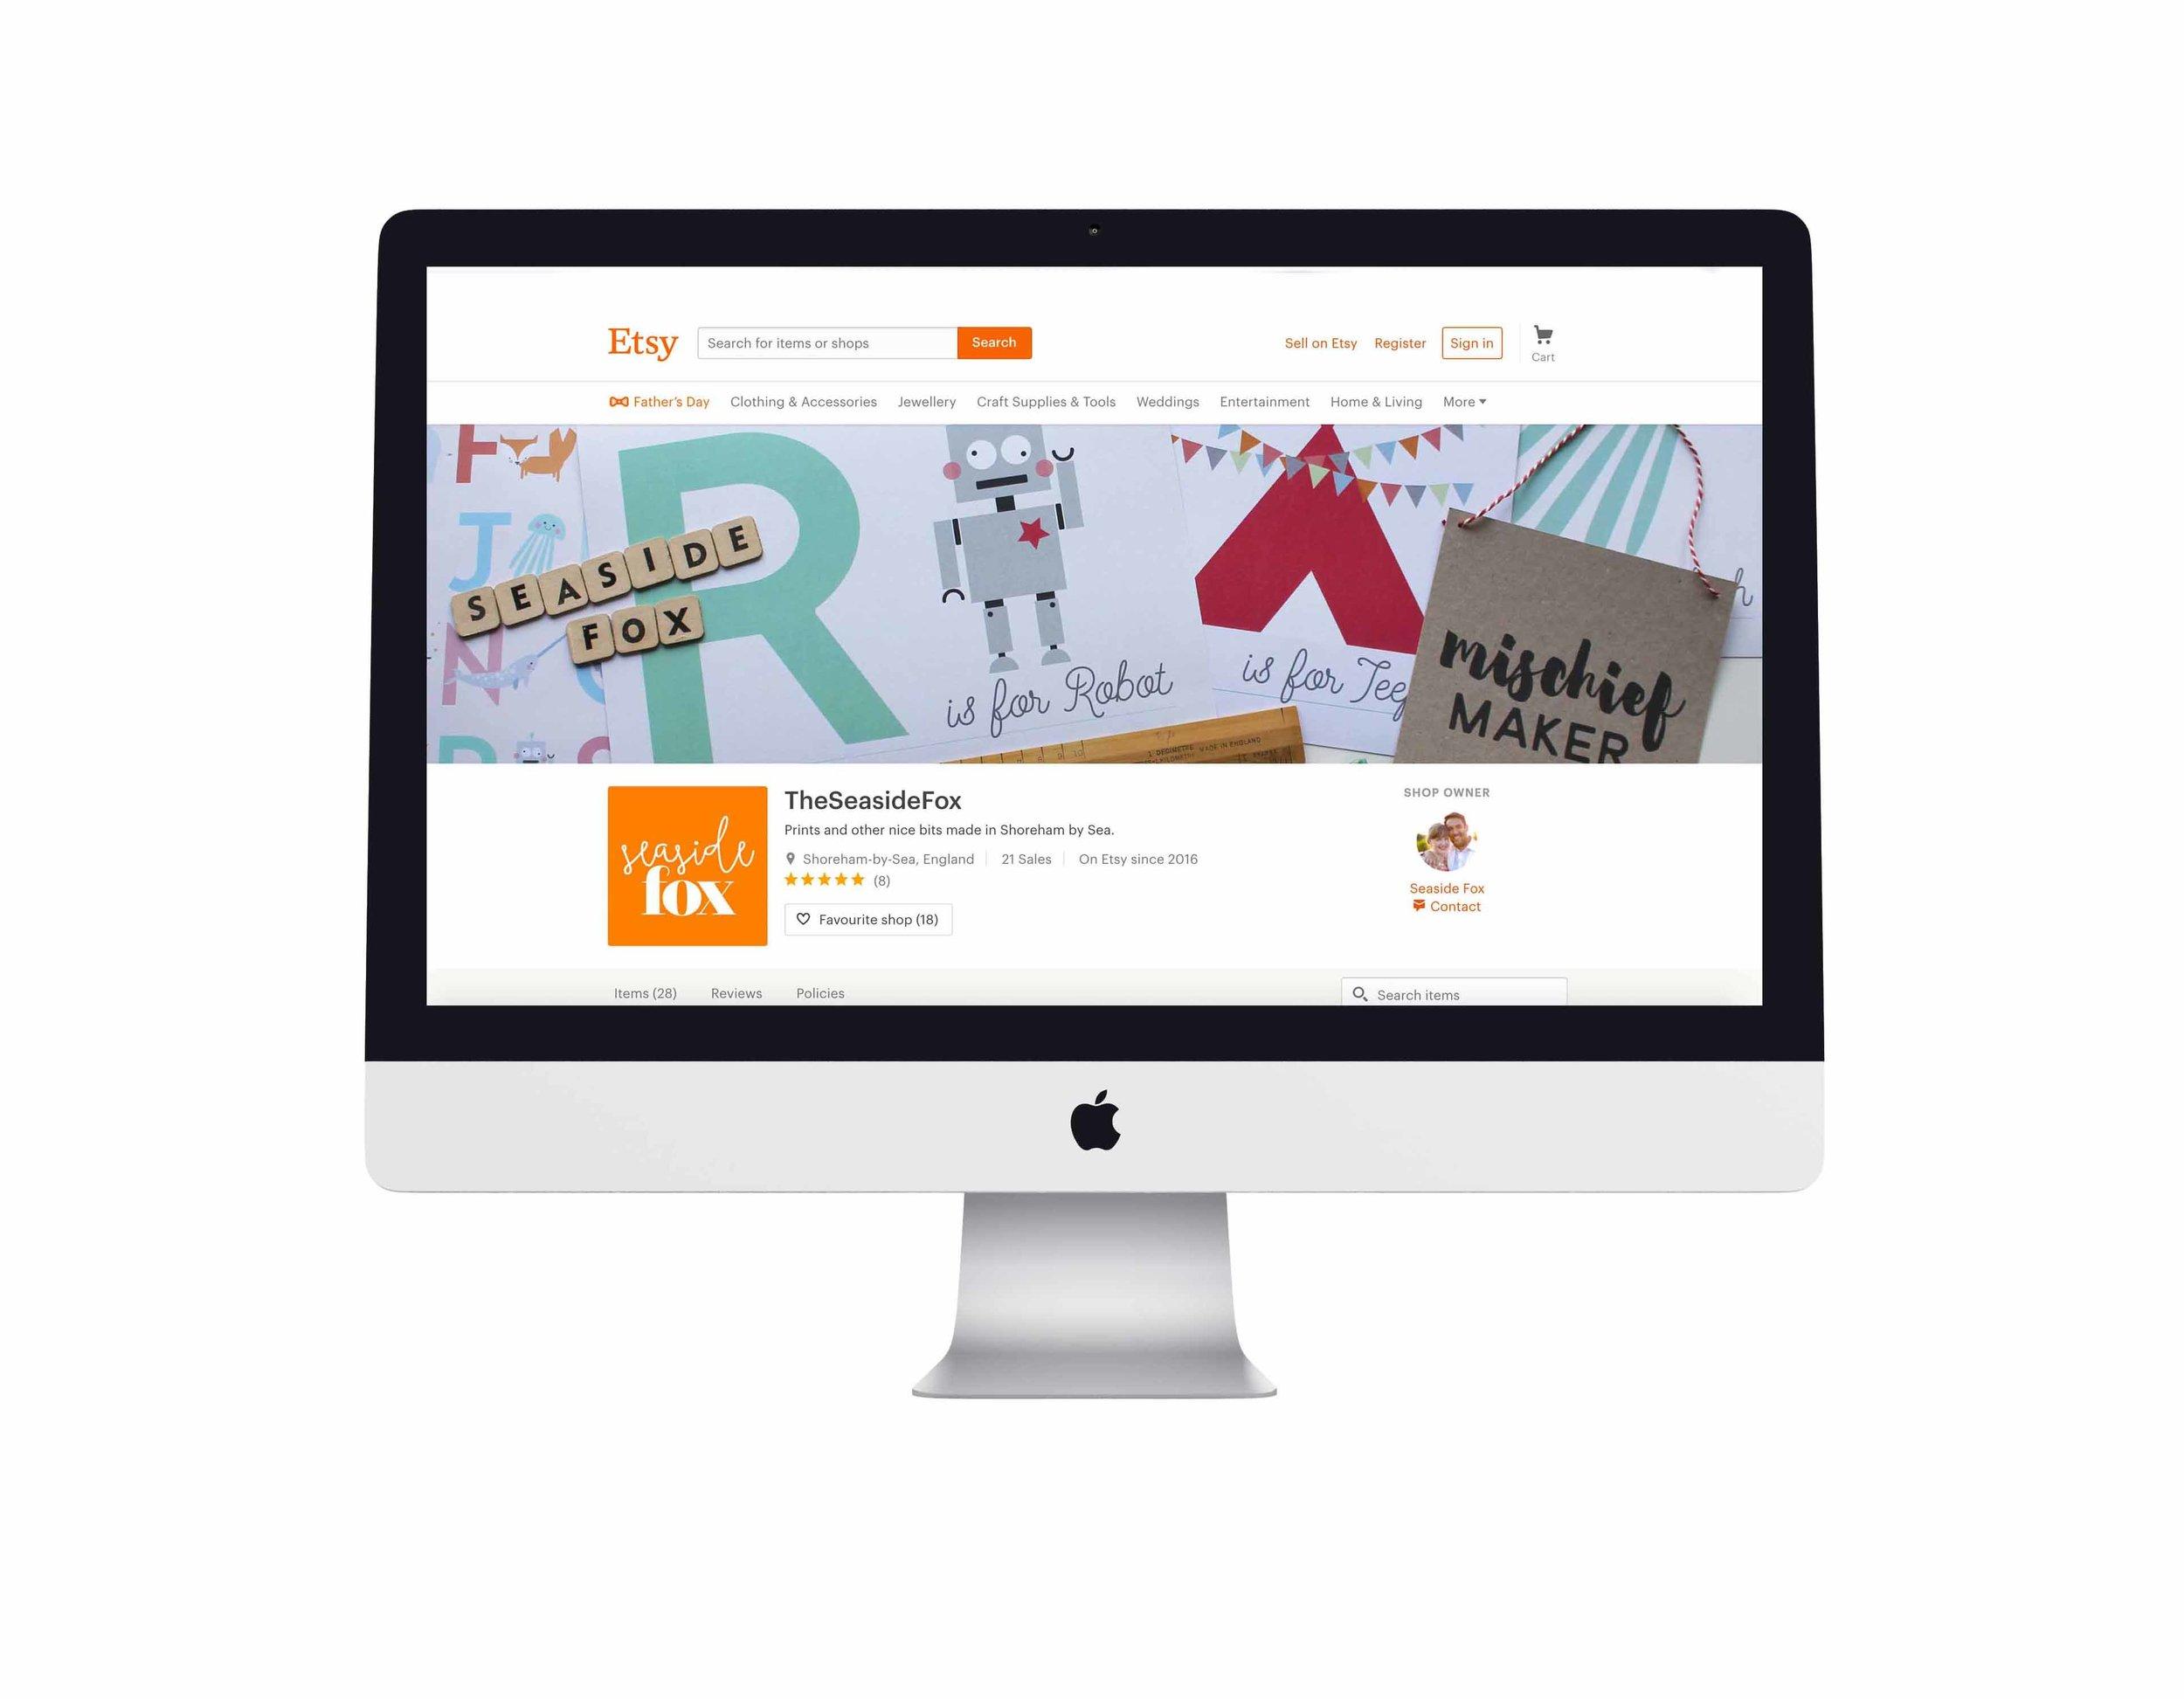 Seaside Fox / Etsy webshop identity